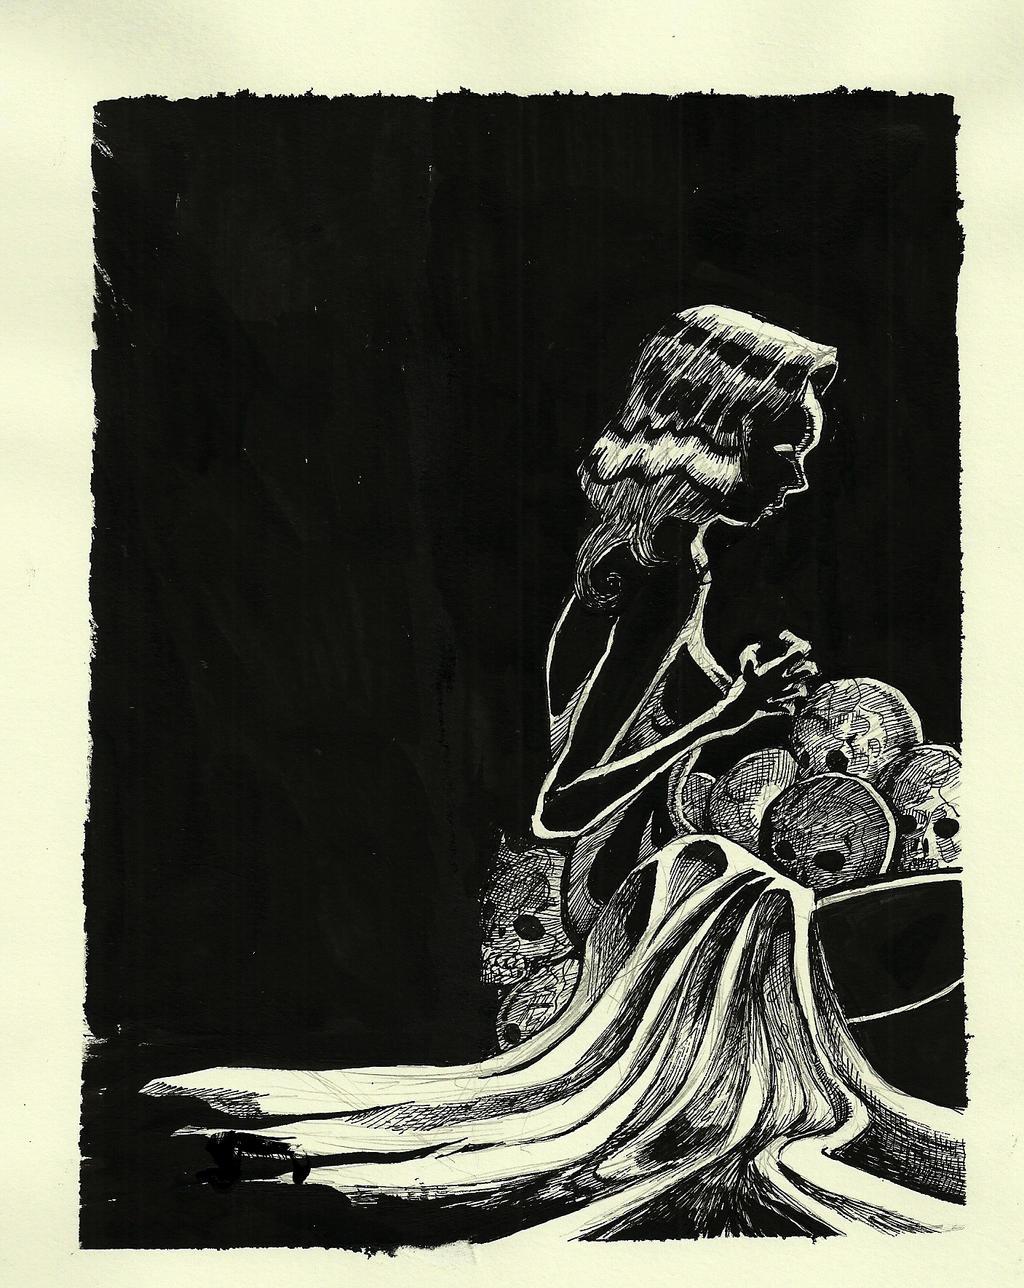 Dance around on your bones by jhames34